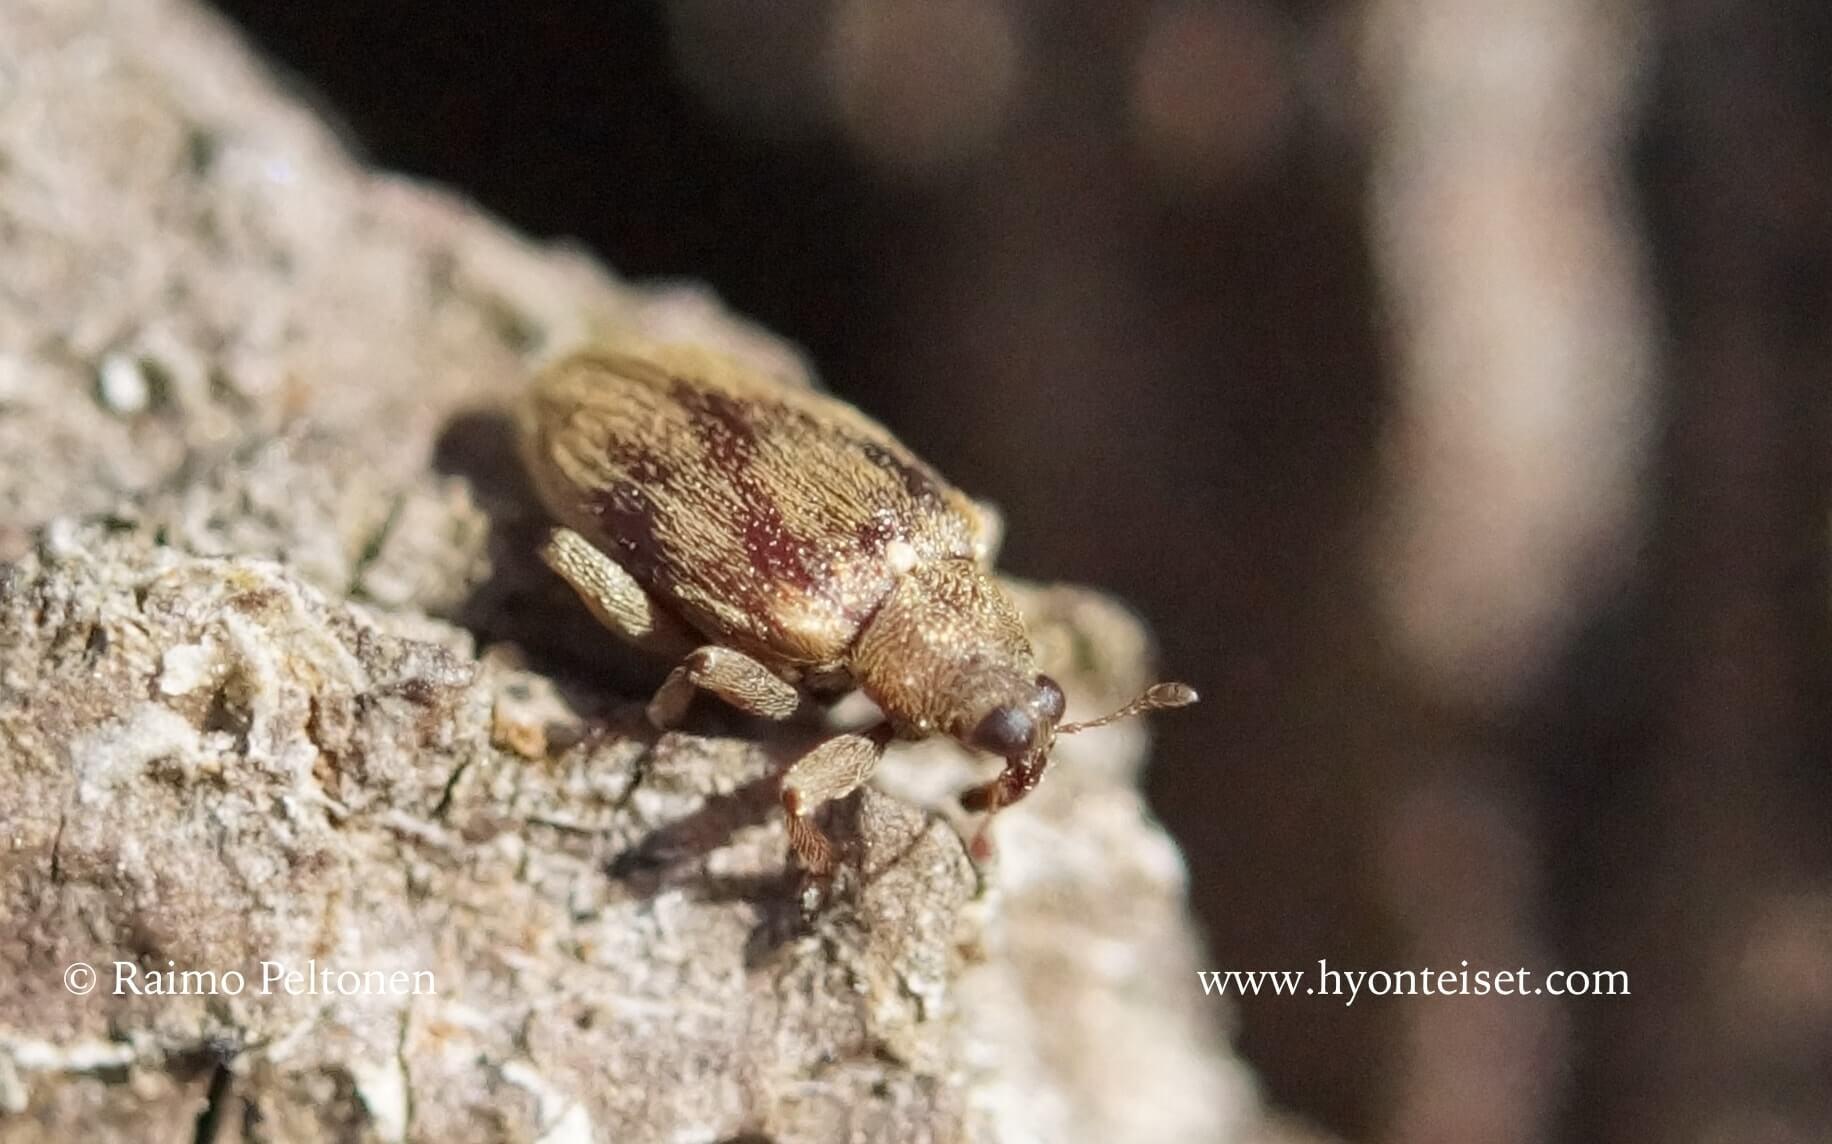 Rhynchaenus testaceus-lepänhyppykärsäkäs (det. Tapio Kujala)